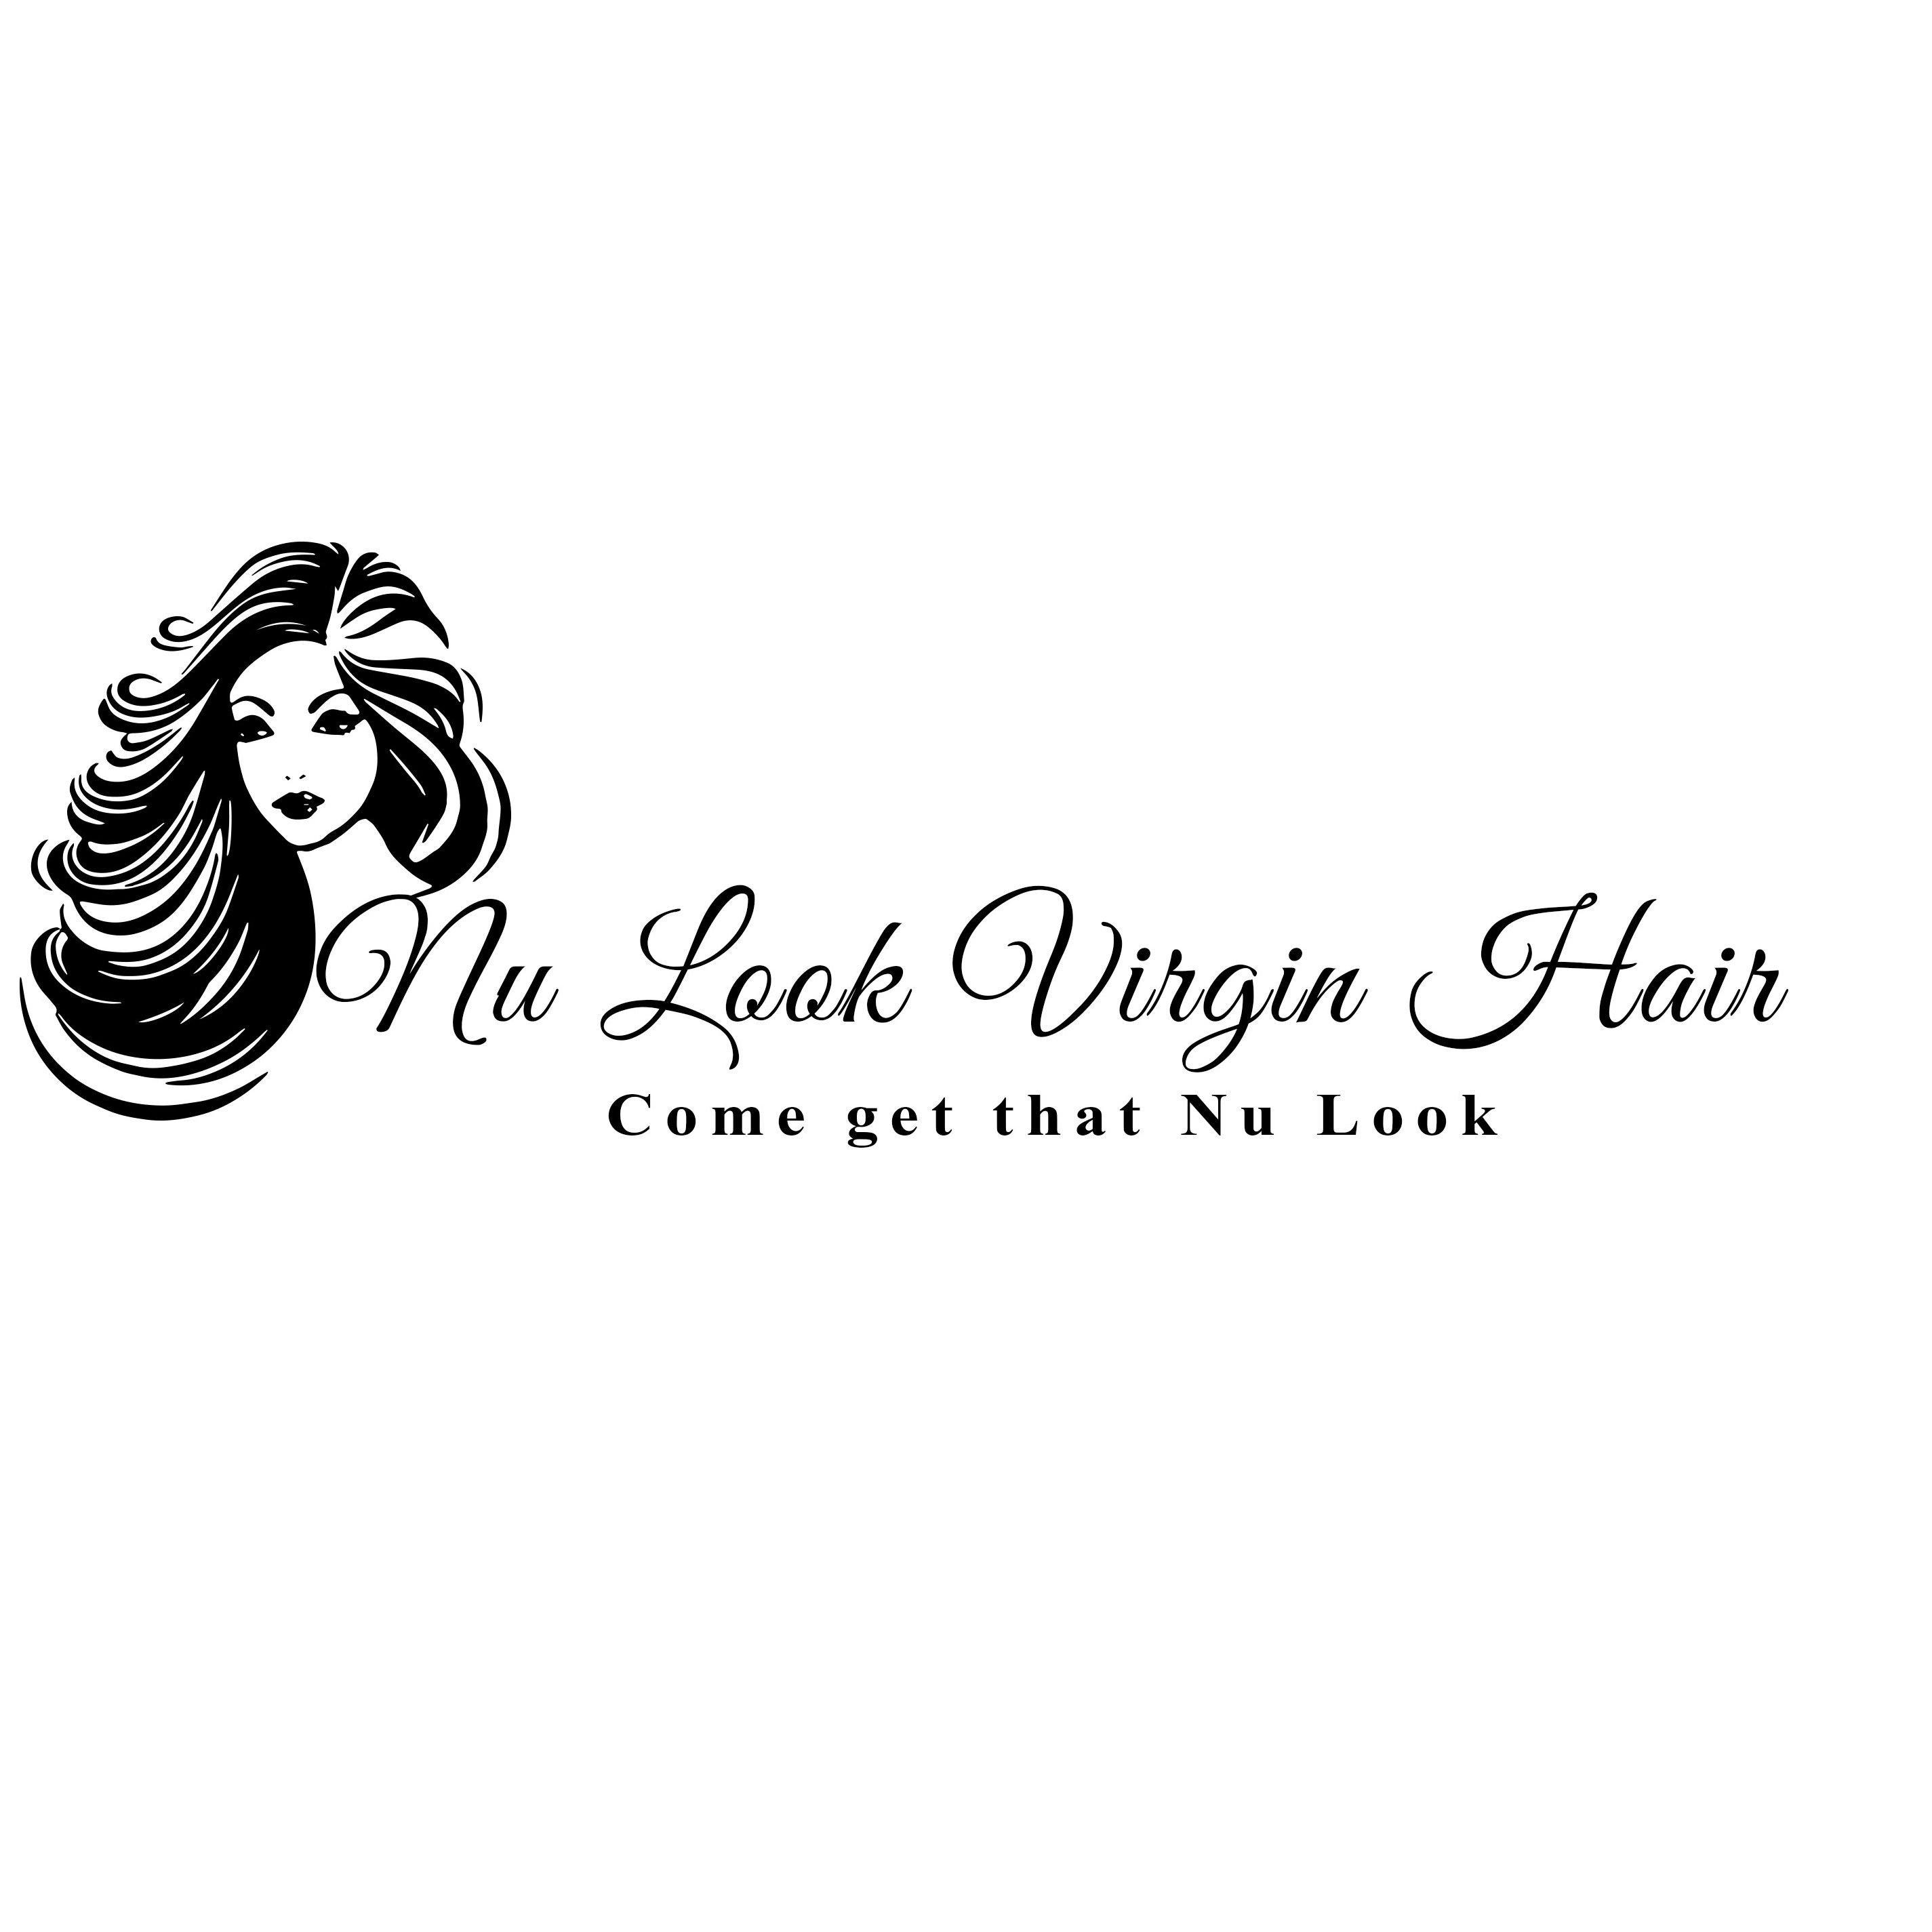 Nu Look Virgin Hair Boutique